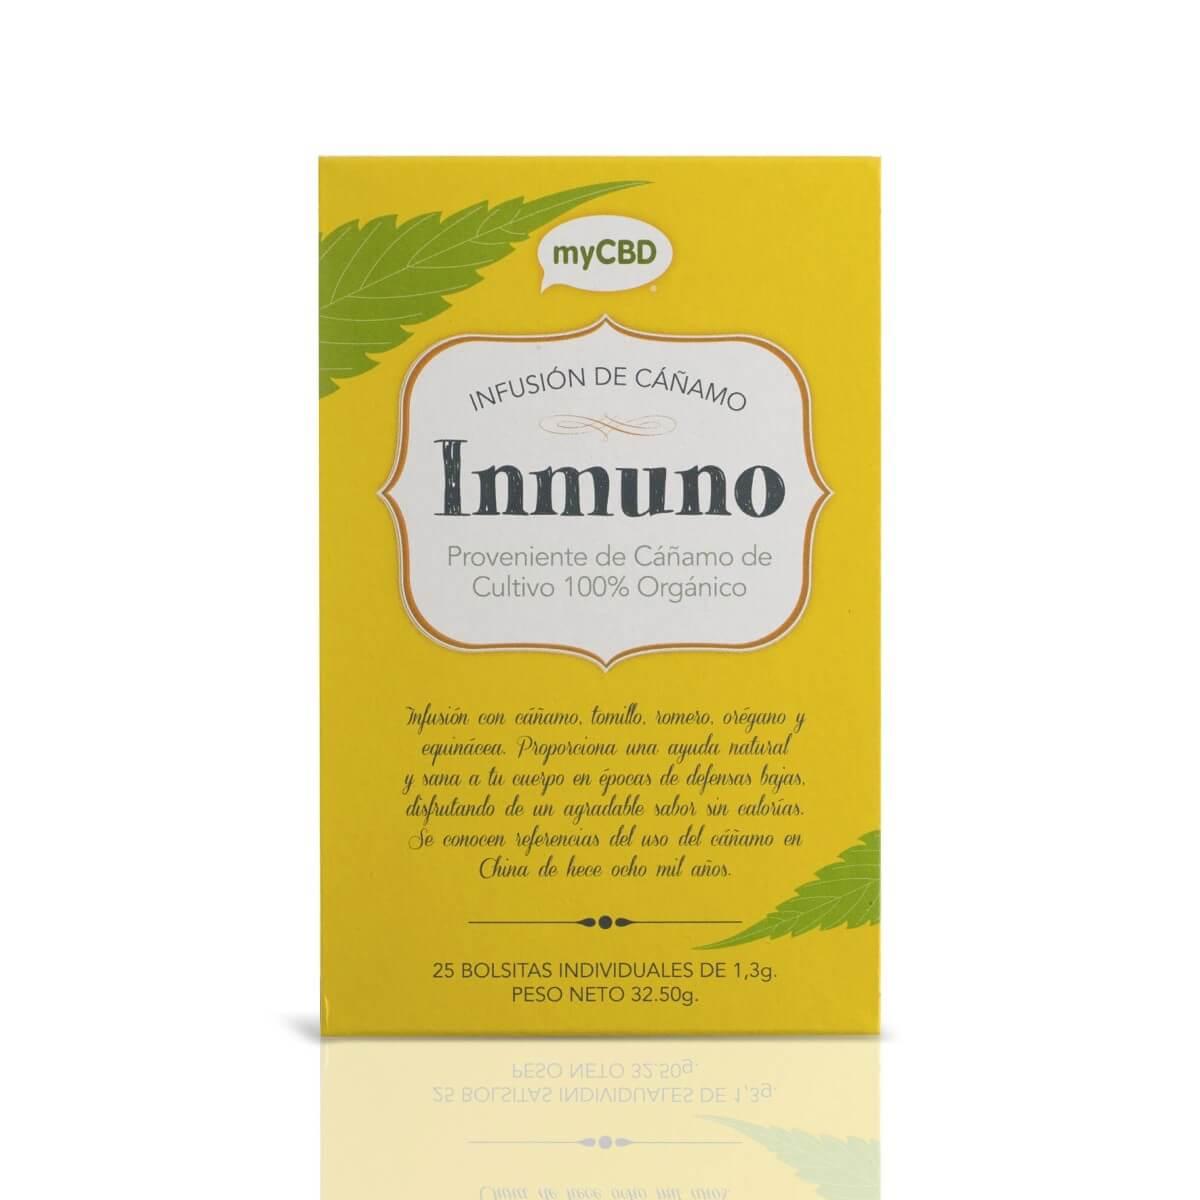 myCBD Inmuno